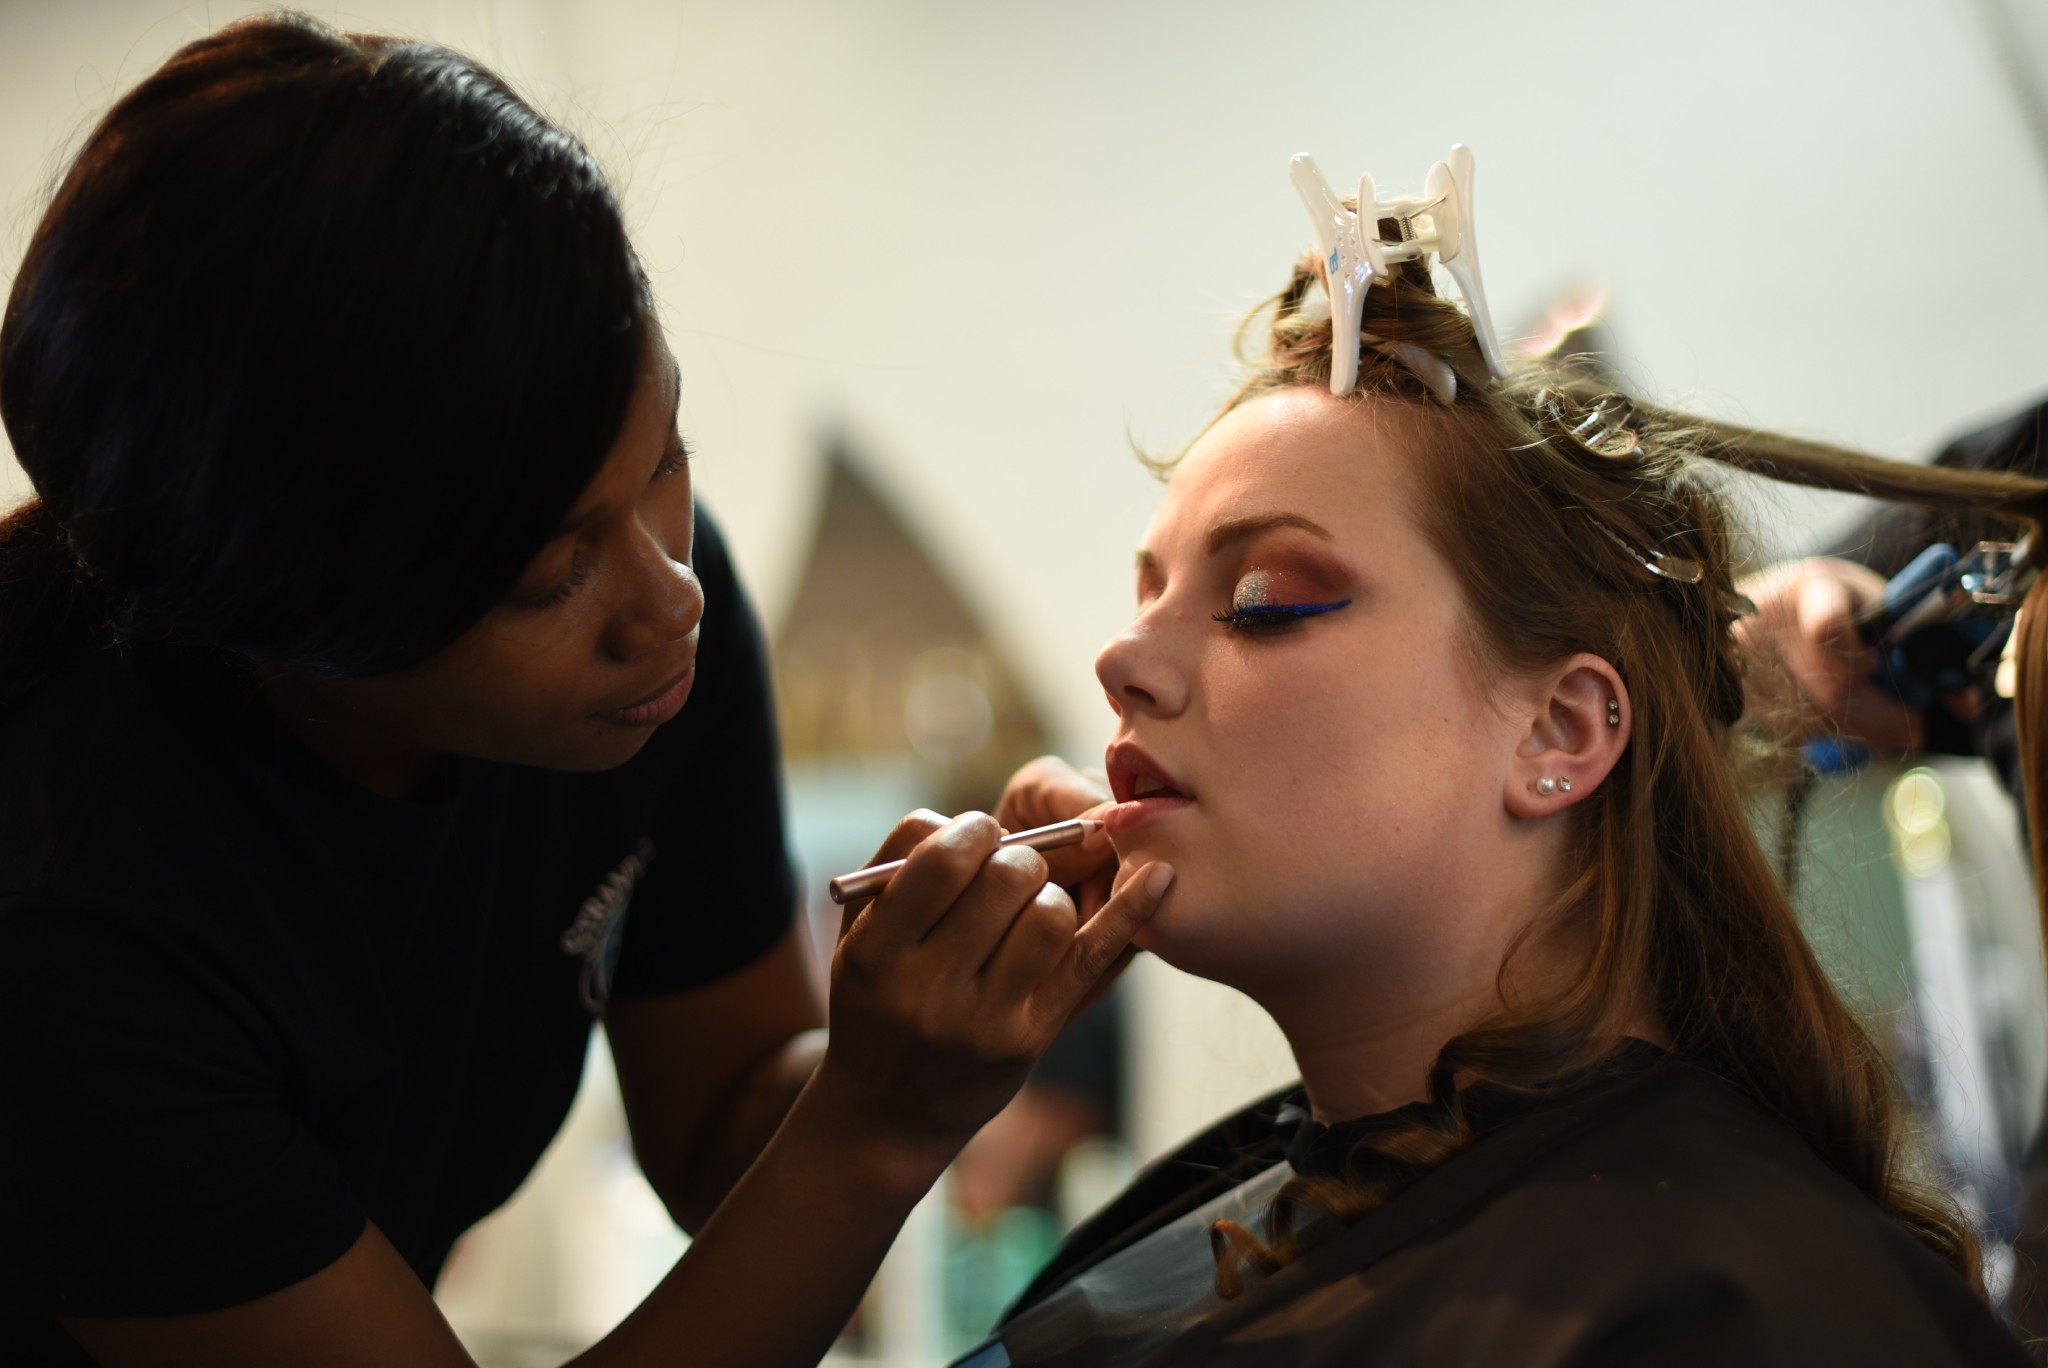 Girl applying lipstick on another girl